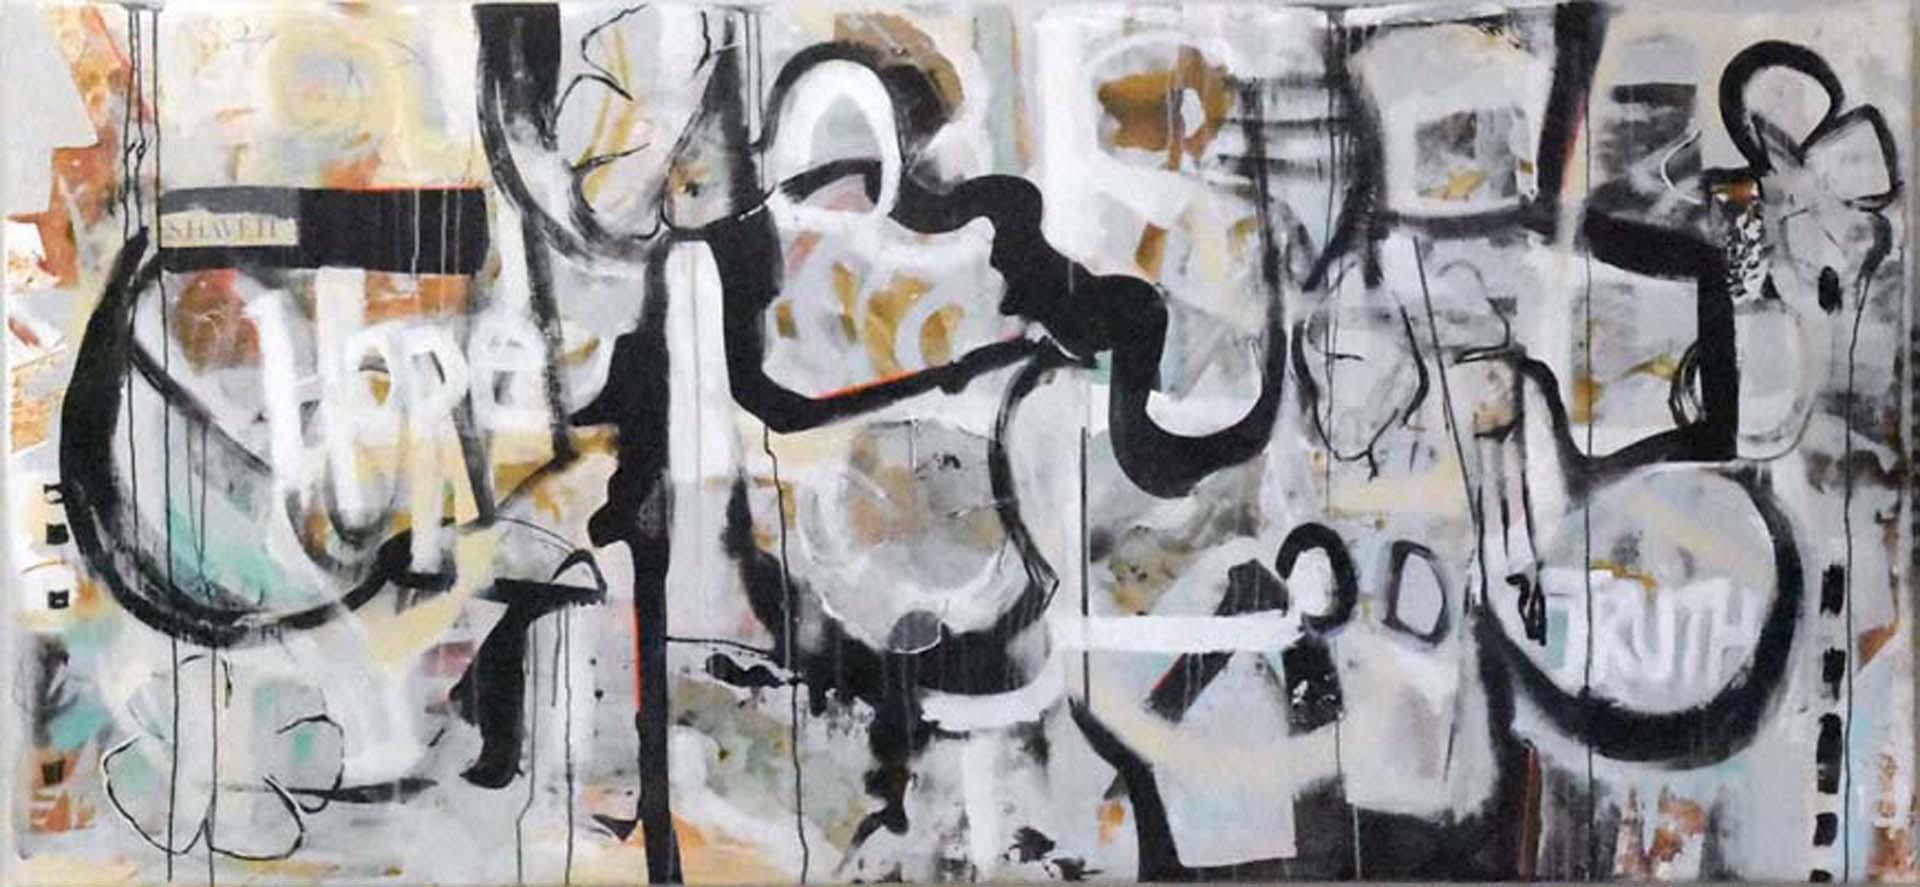 5mardi de veuve alexis street art messages painting on canvas 42 x 90 axeng1